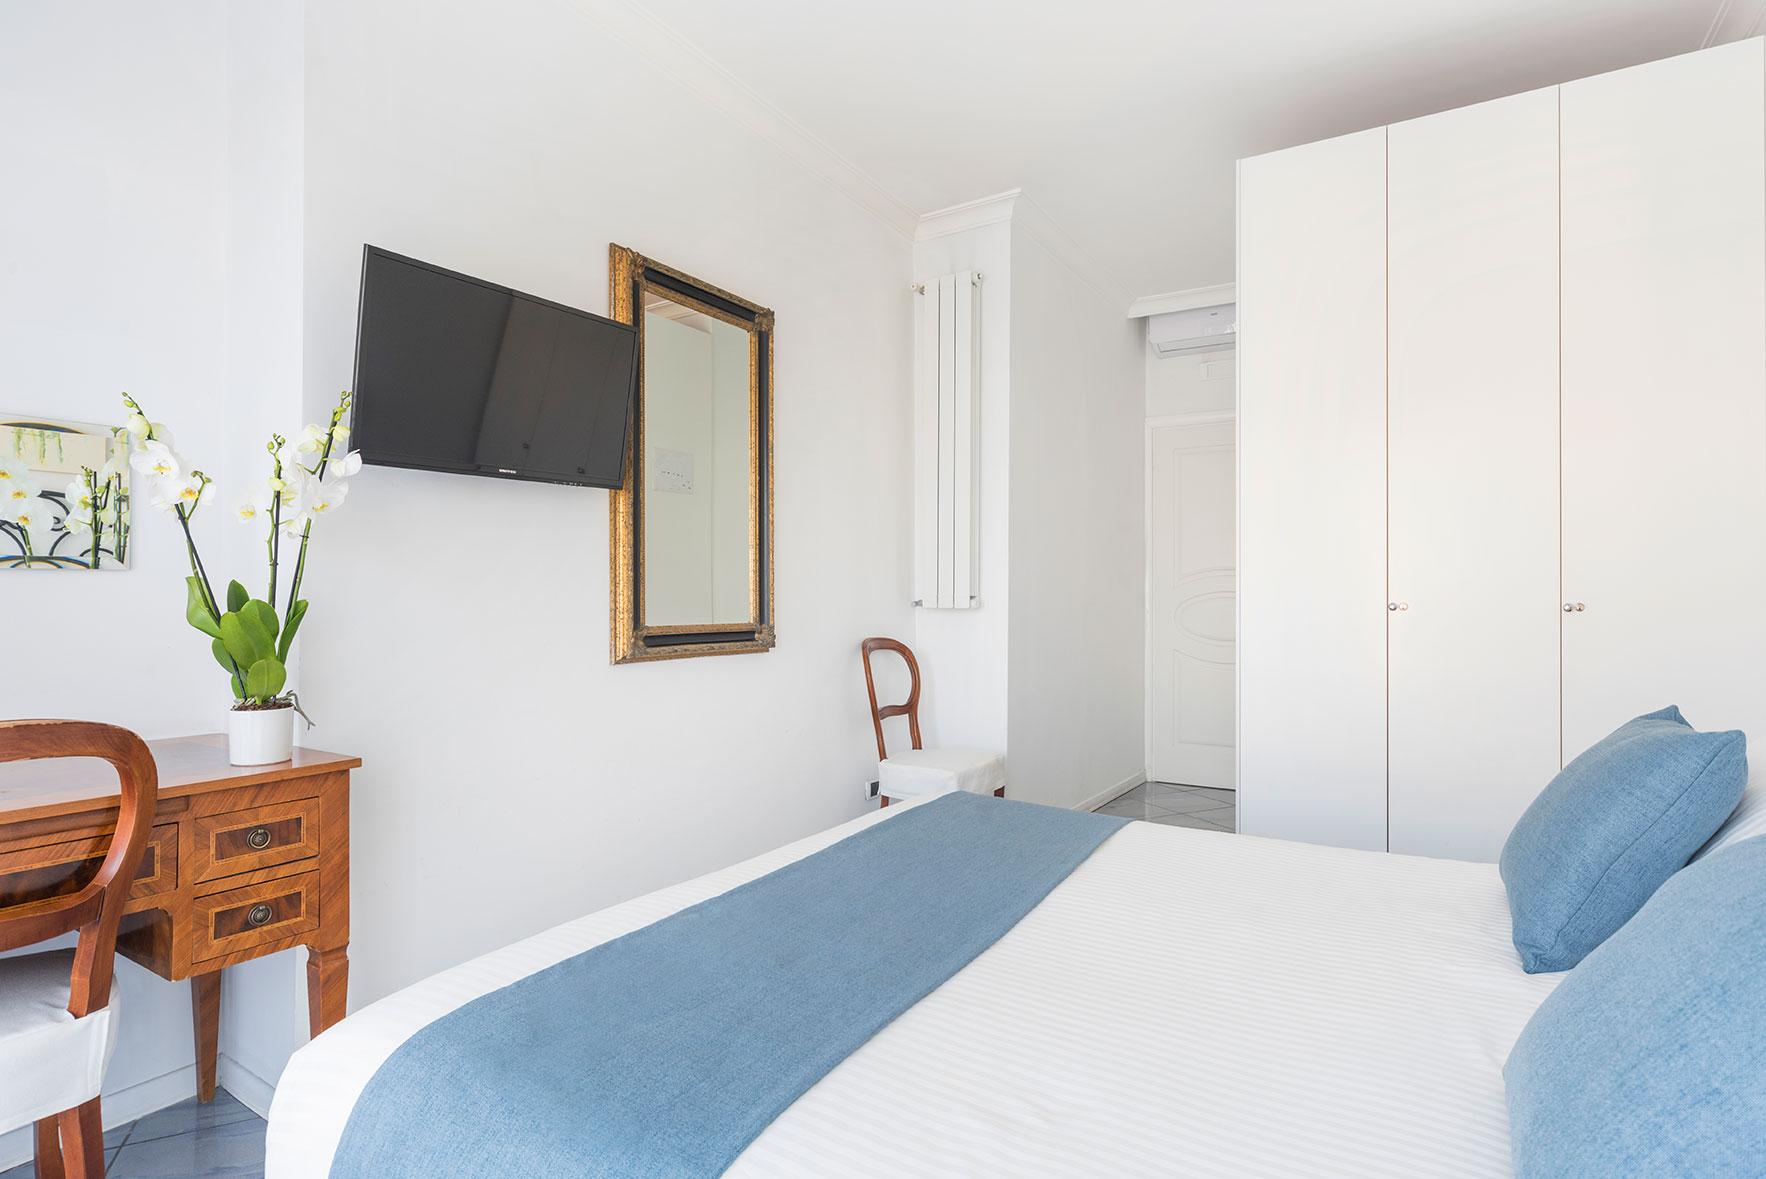 camere-standard-fiorentini-residence-napoli-4